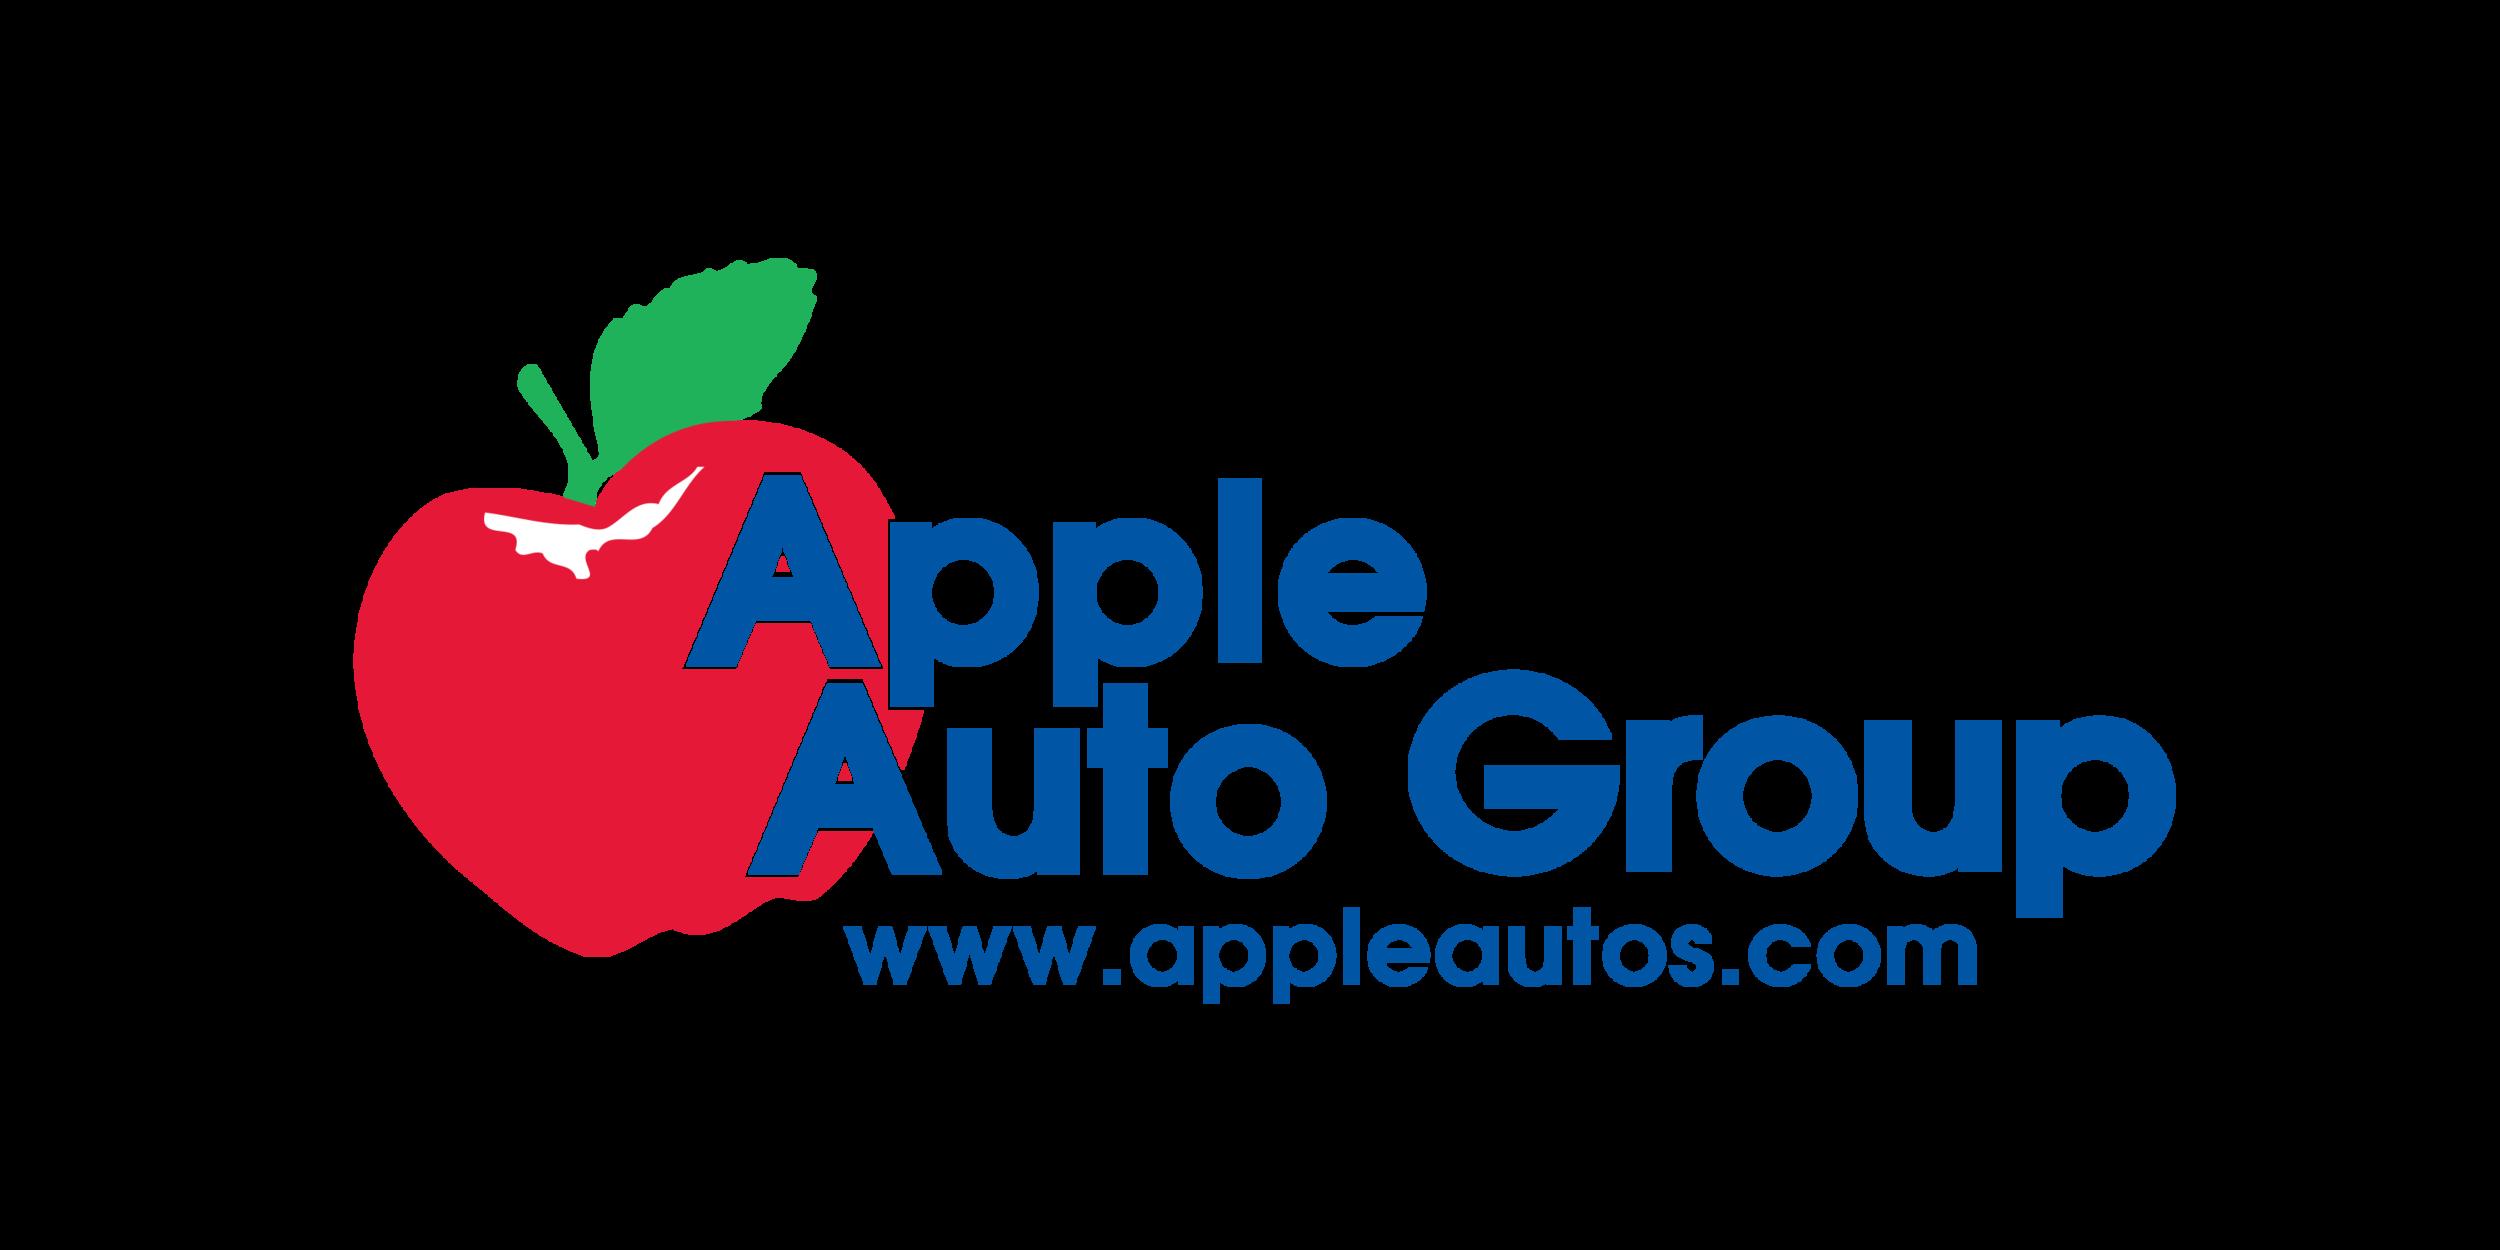 Apple Autos - Before